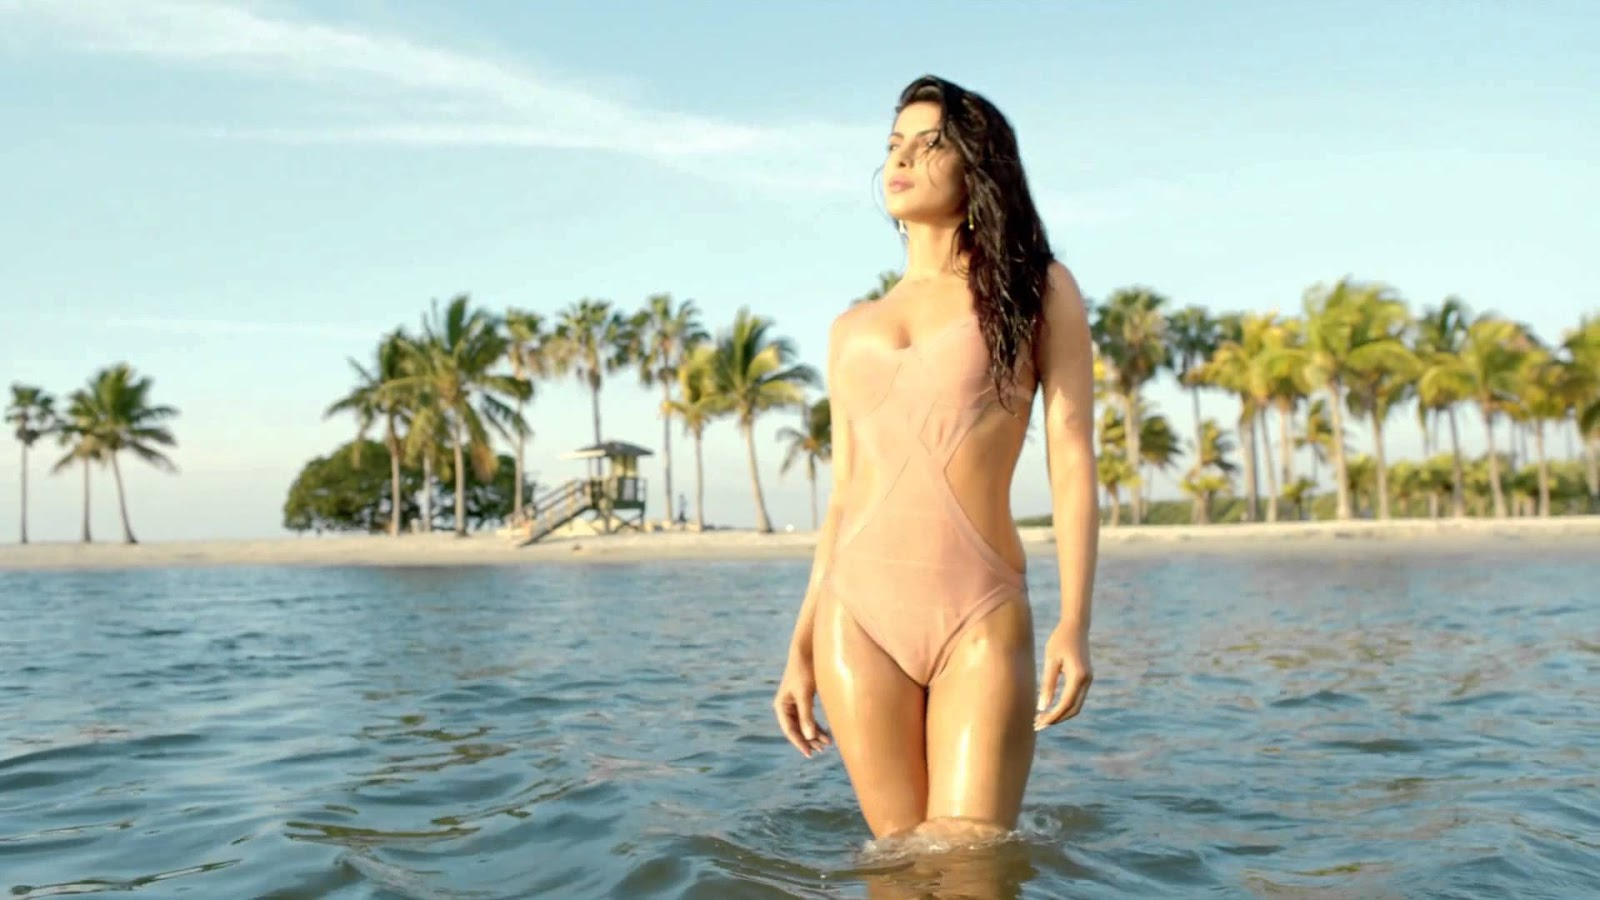 Little mermaid ariel naked boobs